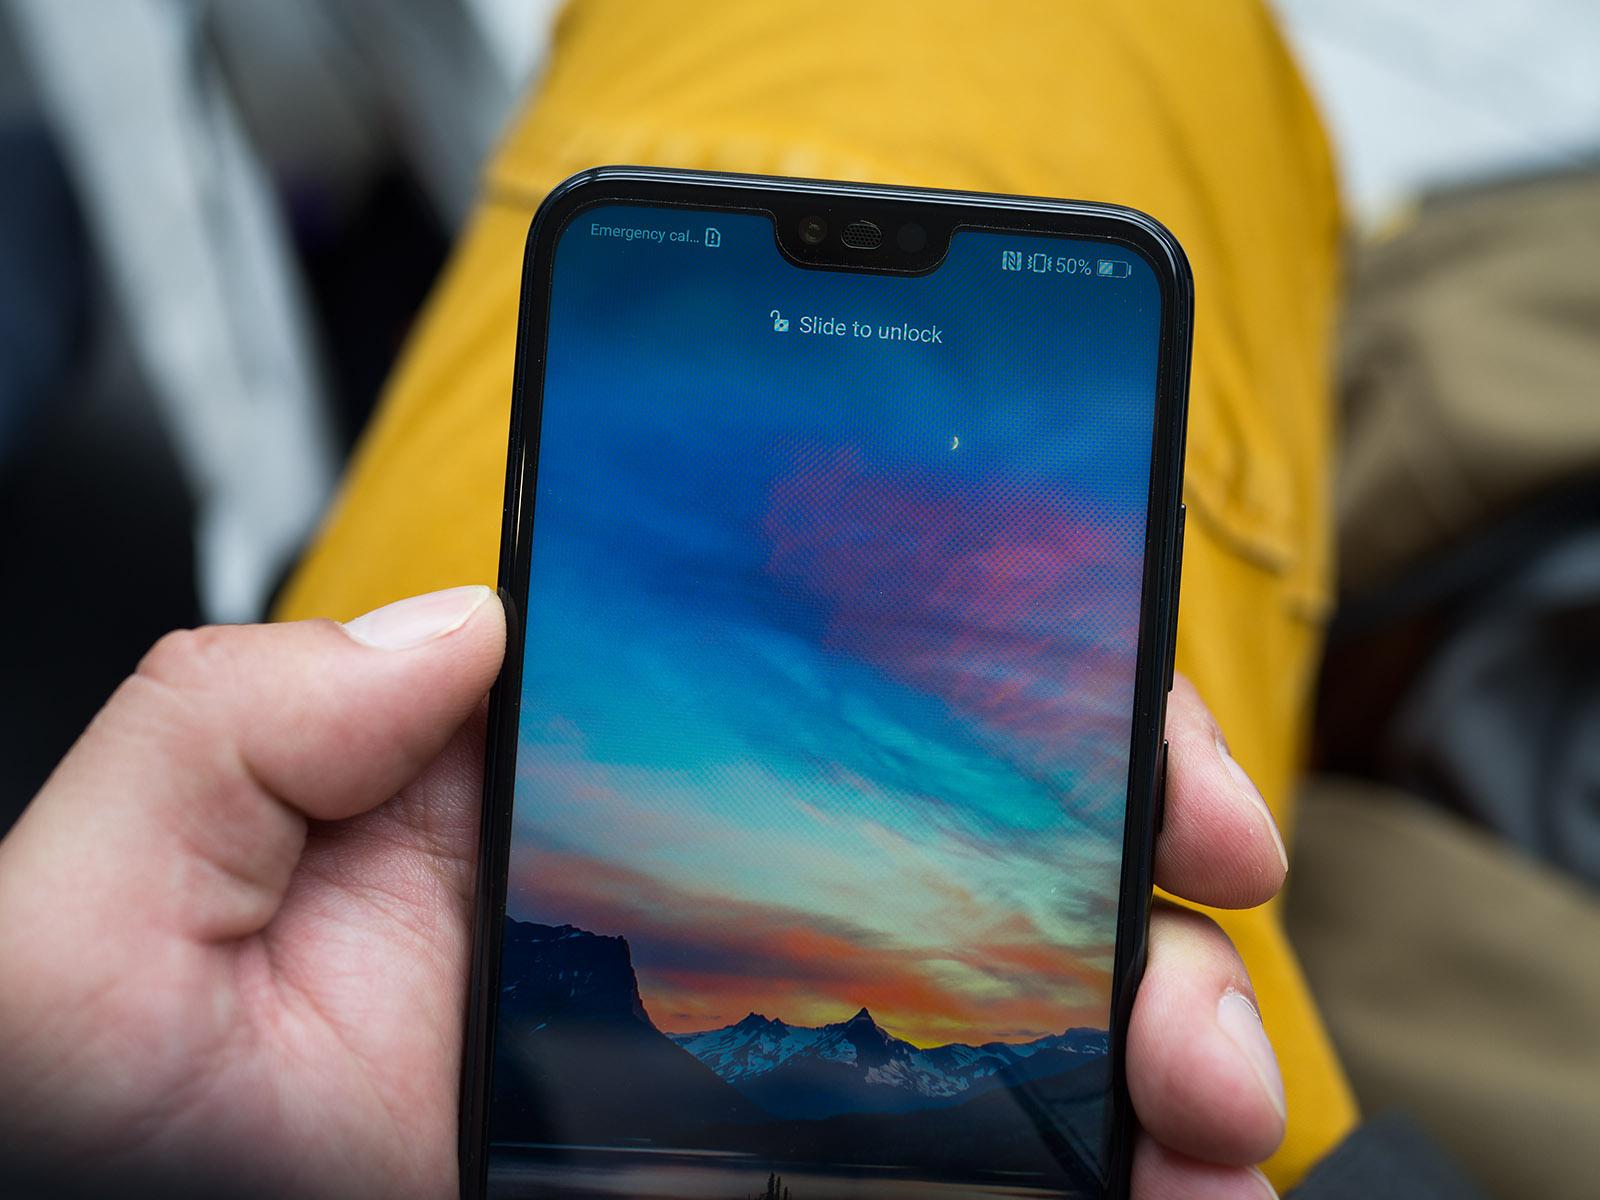 Как фотографирует новый Honor 10. Сравниваем с Huawei P20 и iPhone 7 Plus - 5